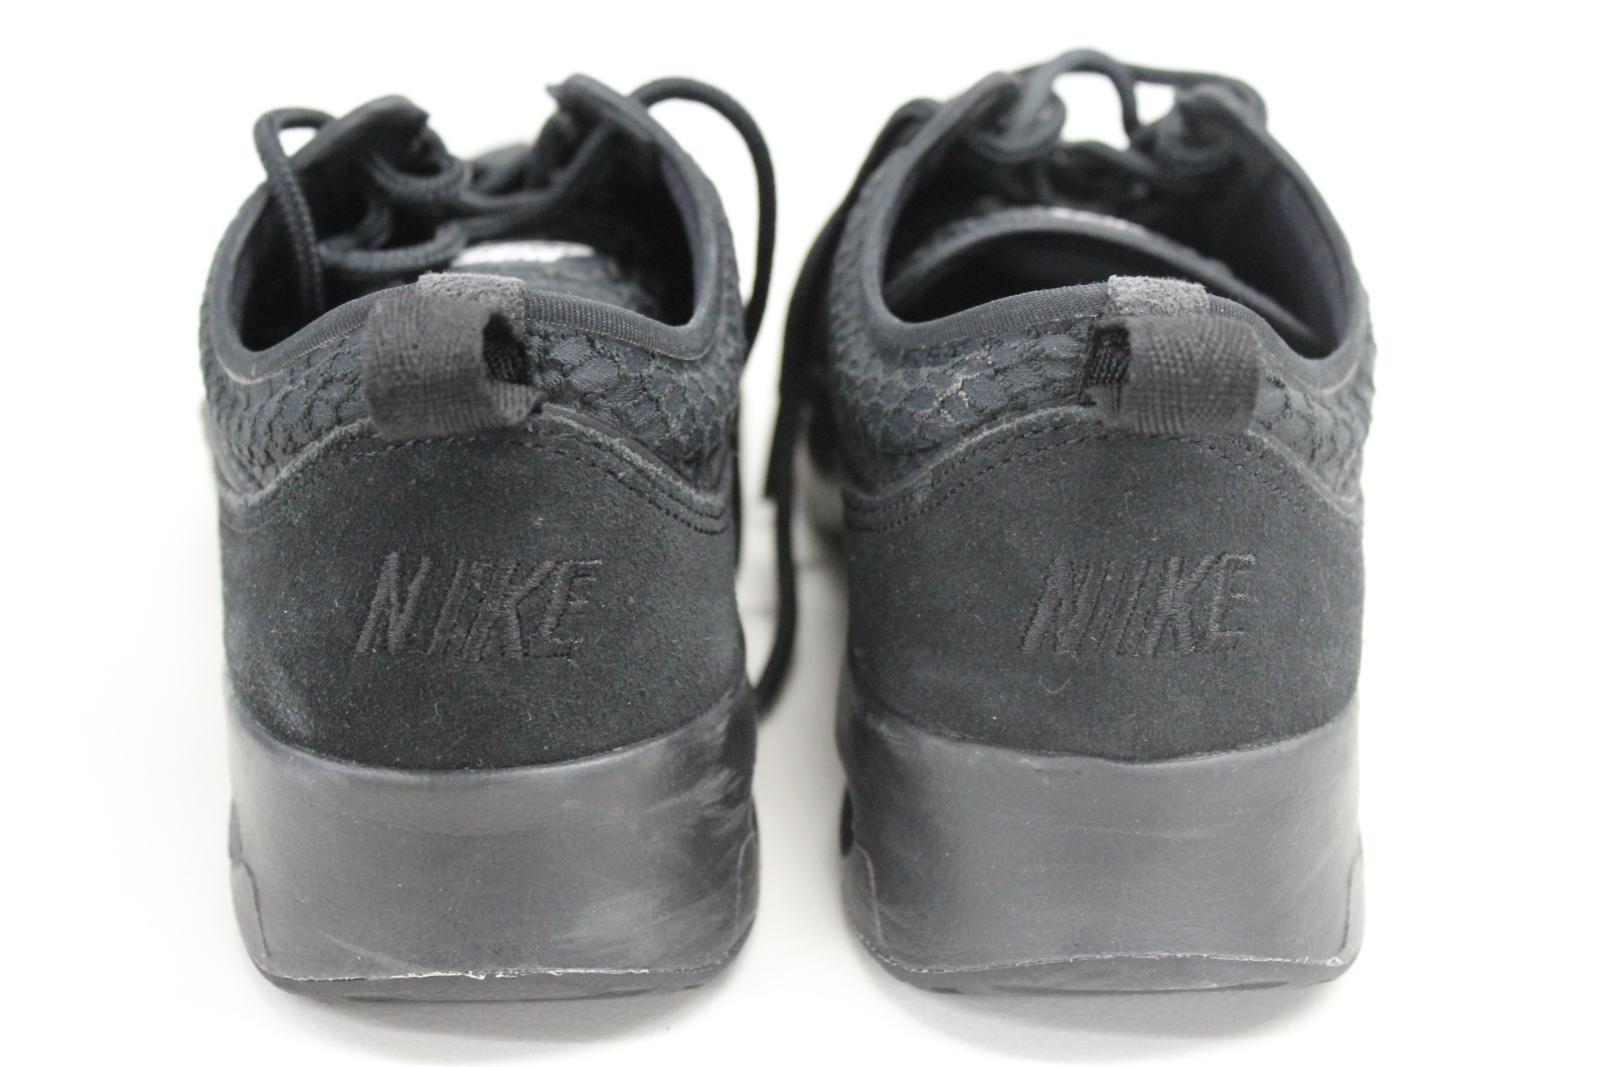 Nike-Air-Max-Thea-Ultra-Femmes-Baskets-noir-sportswear-Taille-UK4-5-EU38 miniature 6